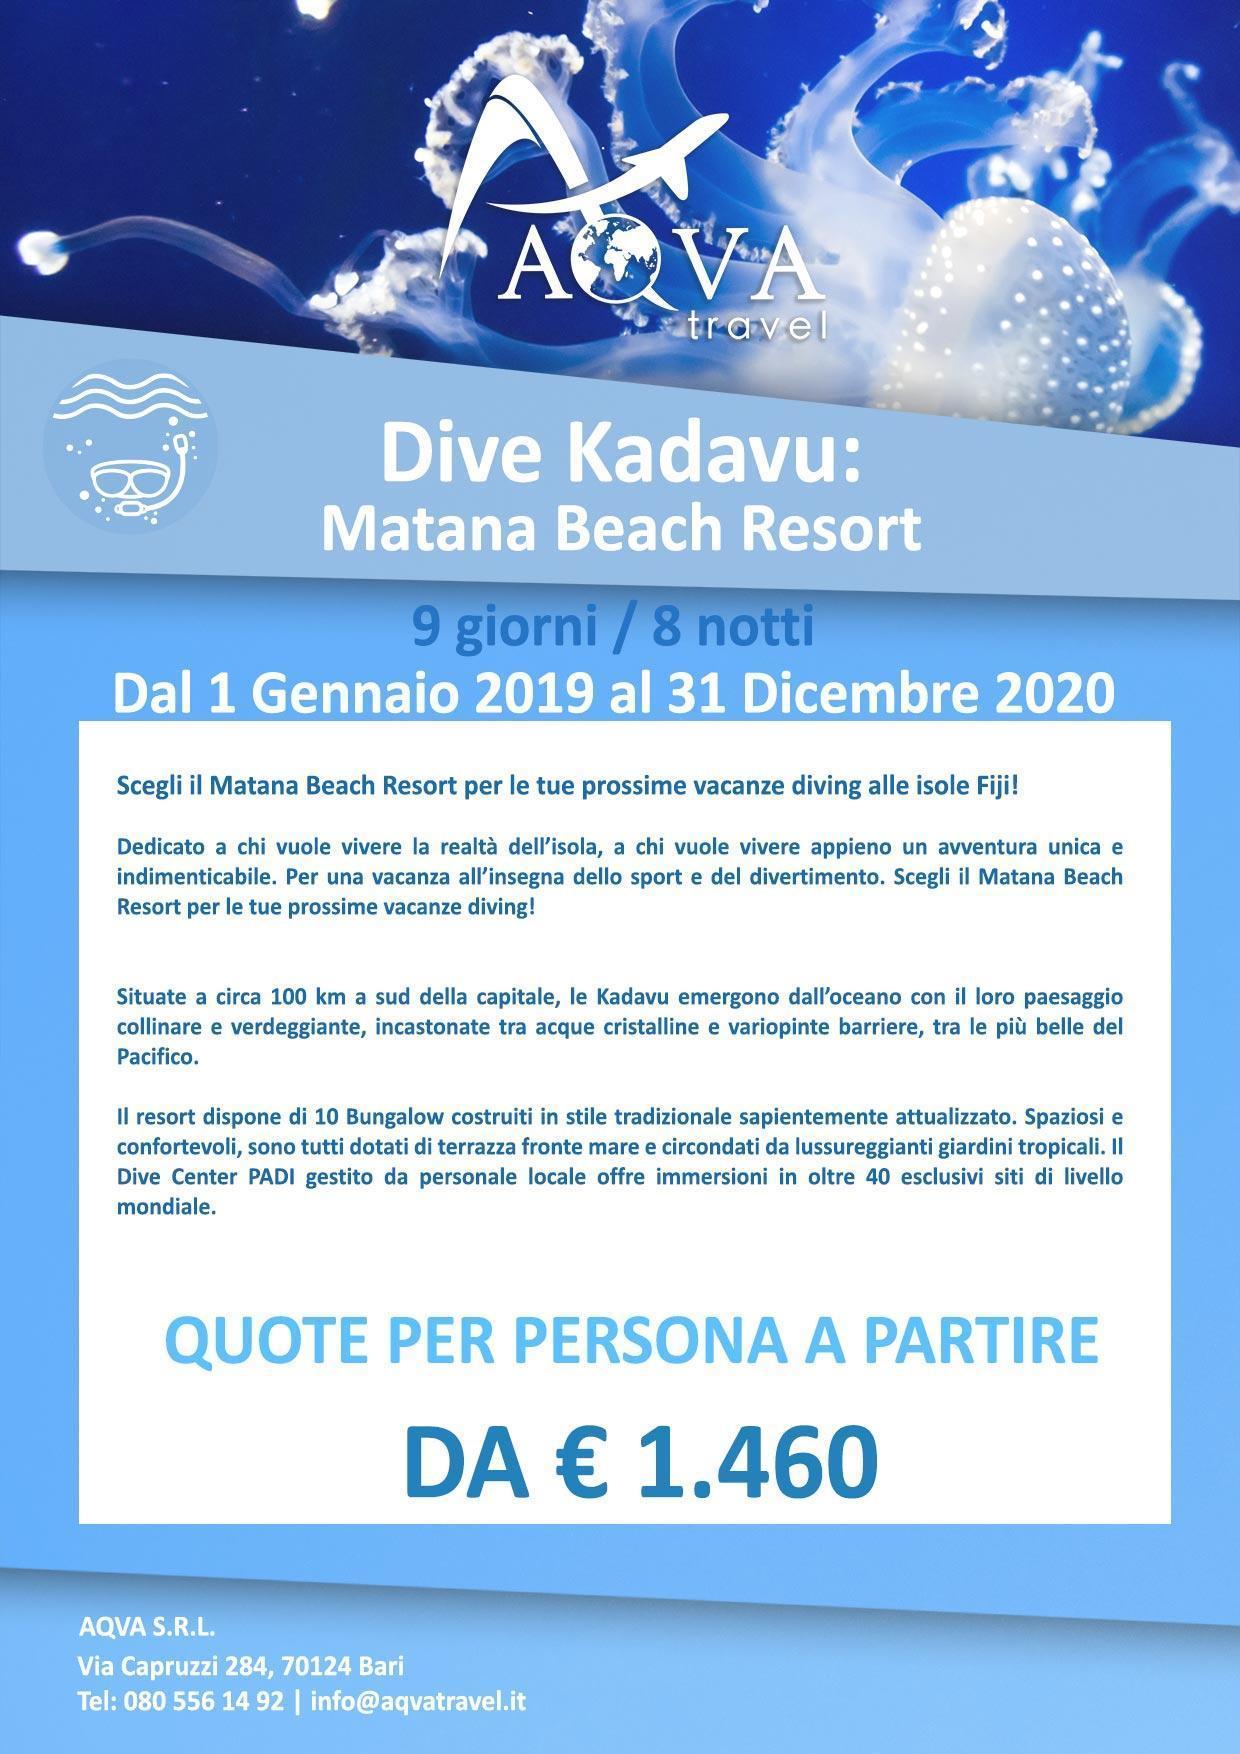 Subacquea-Dive-Kadavu-Matana-Beach-Resort-subacquea-offerte-agenzia-di-viaggi-Bari-AQVATRAVEL-it